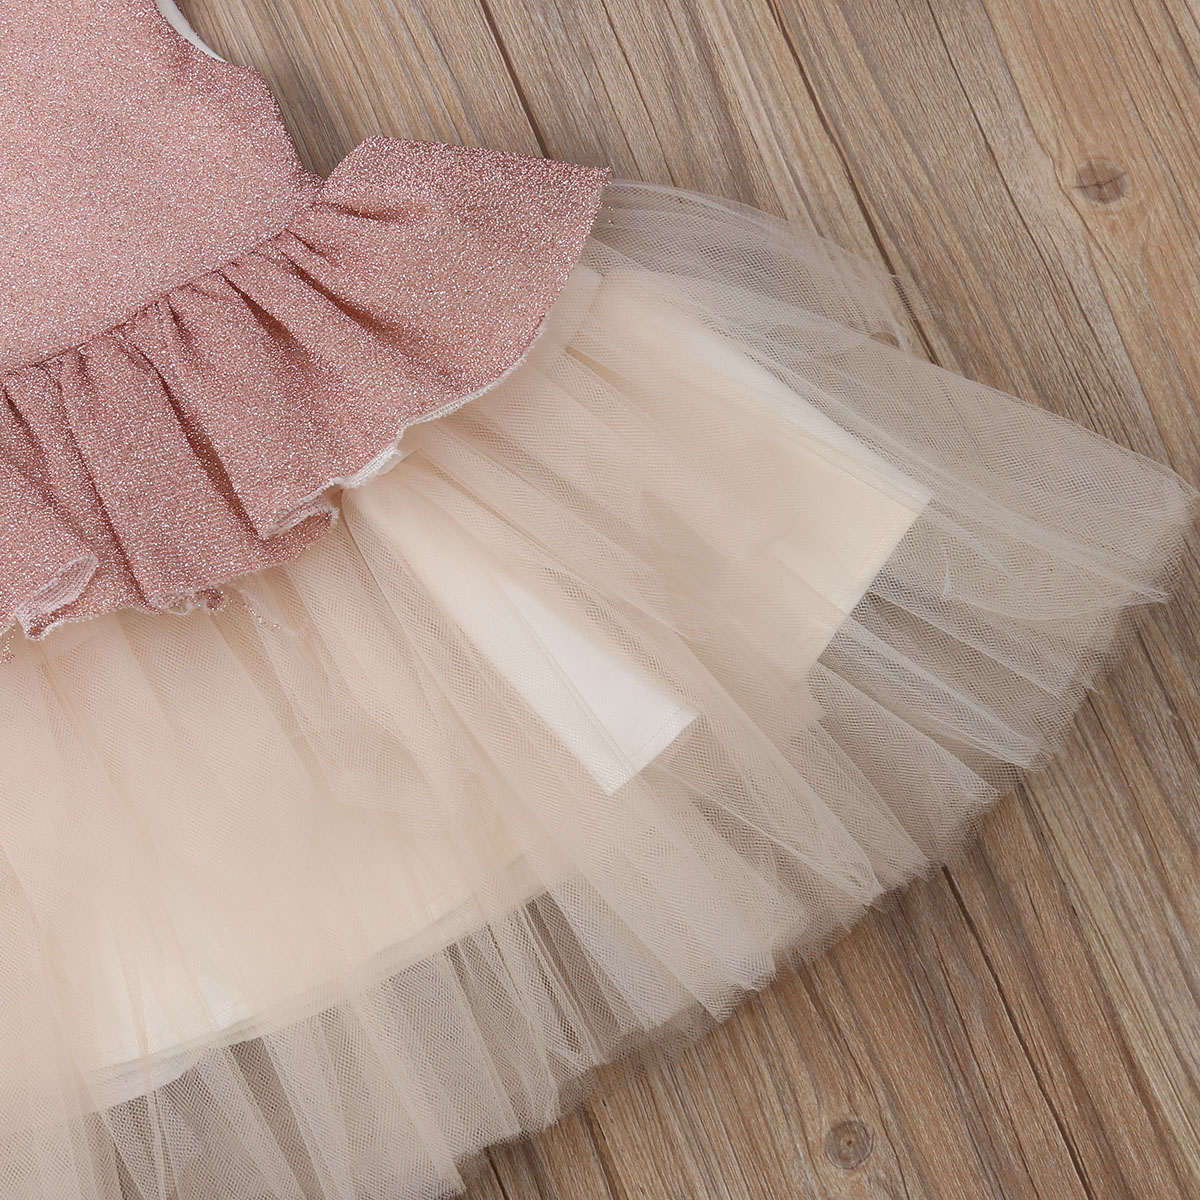 Girls Sparkly Tutu Tulle Dress Handmade  white Princess party summer